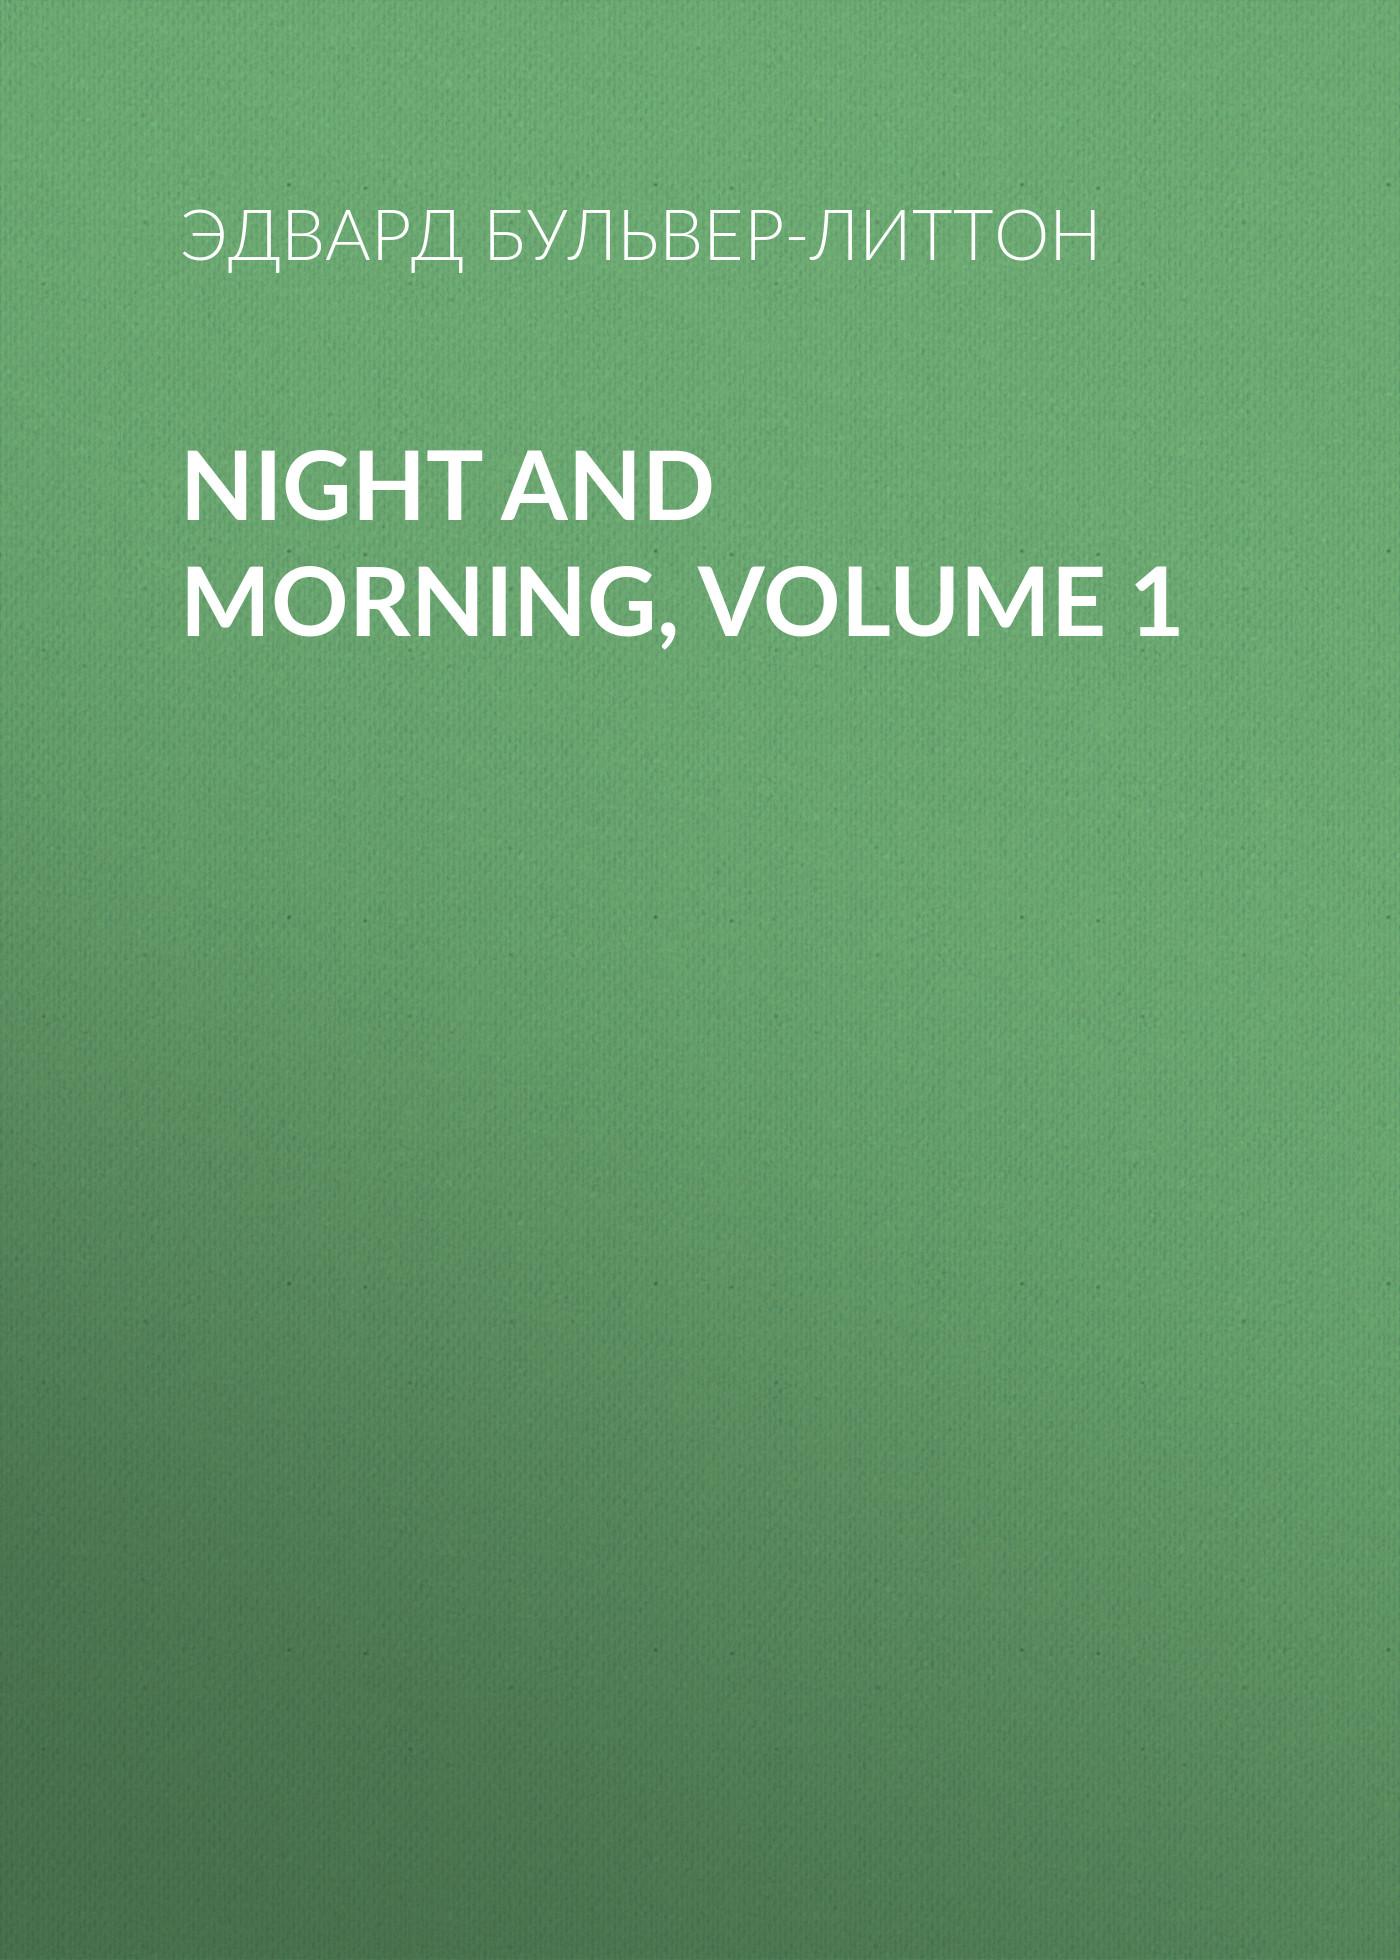 Эдвард Бульвер-Литтон Night and Morning, Volume 1 bumf volume 1